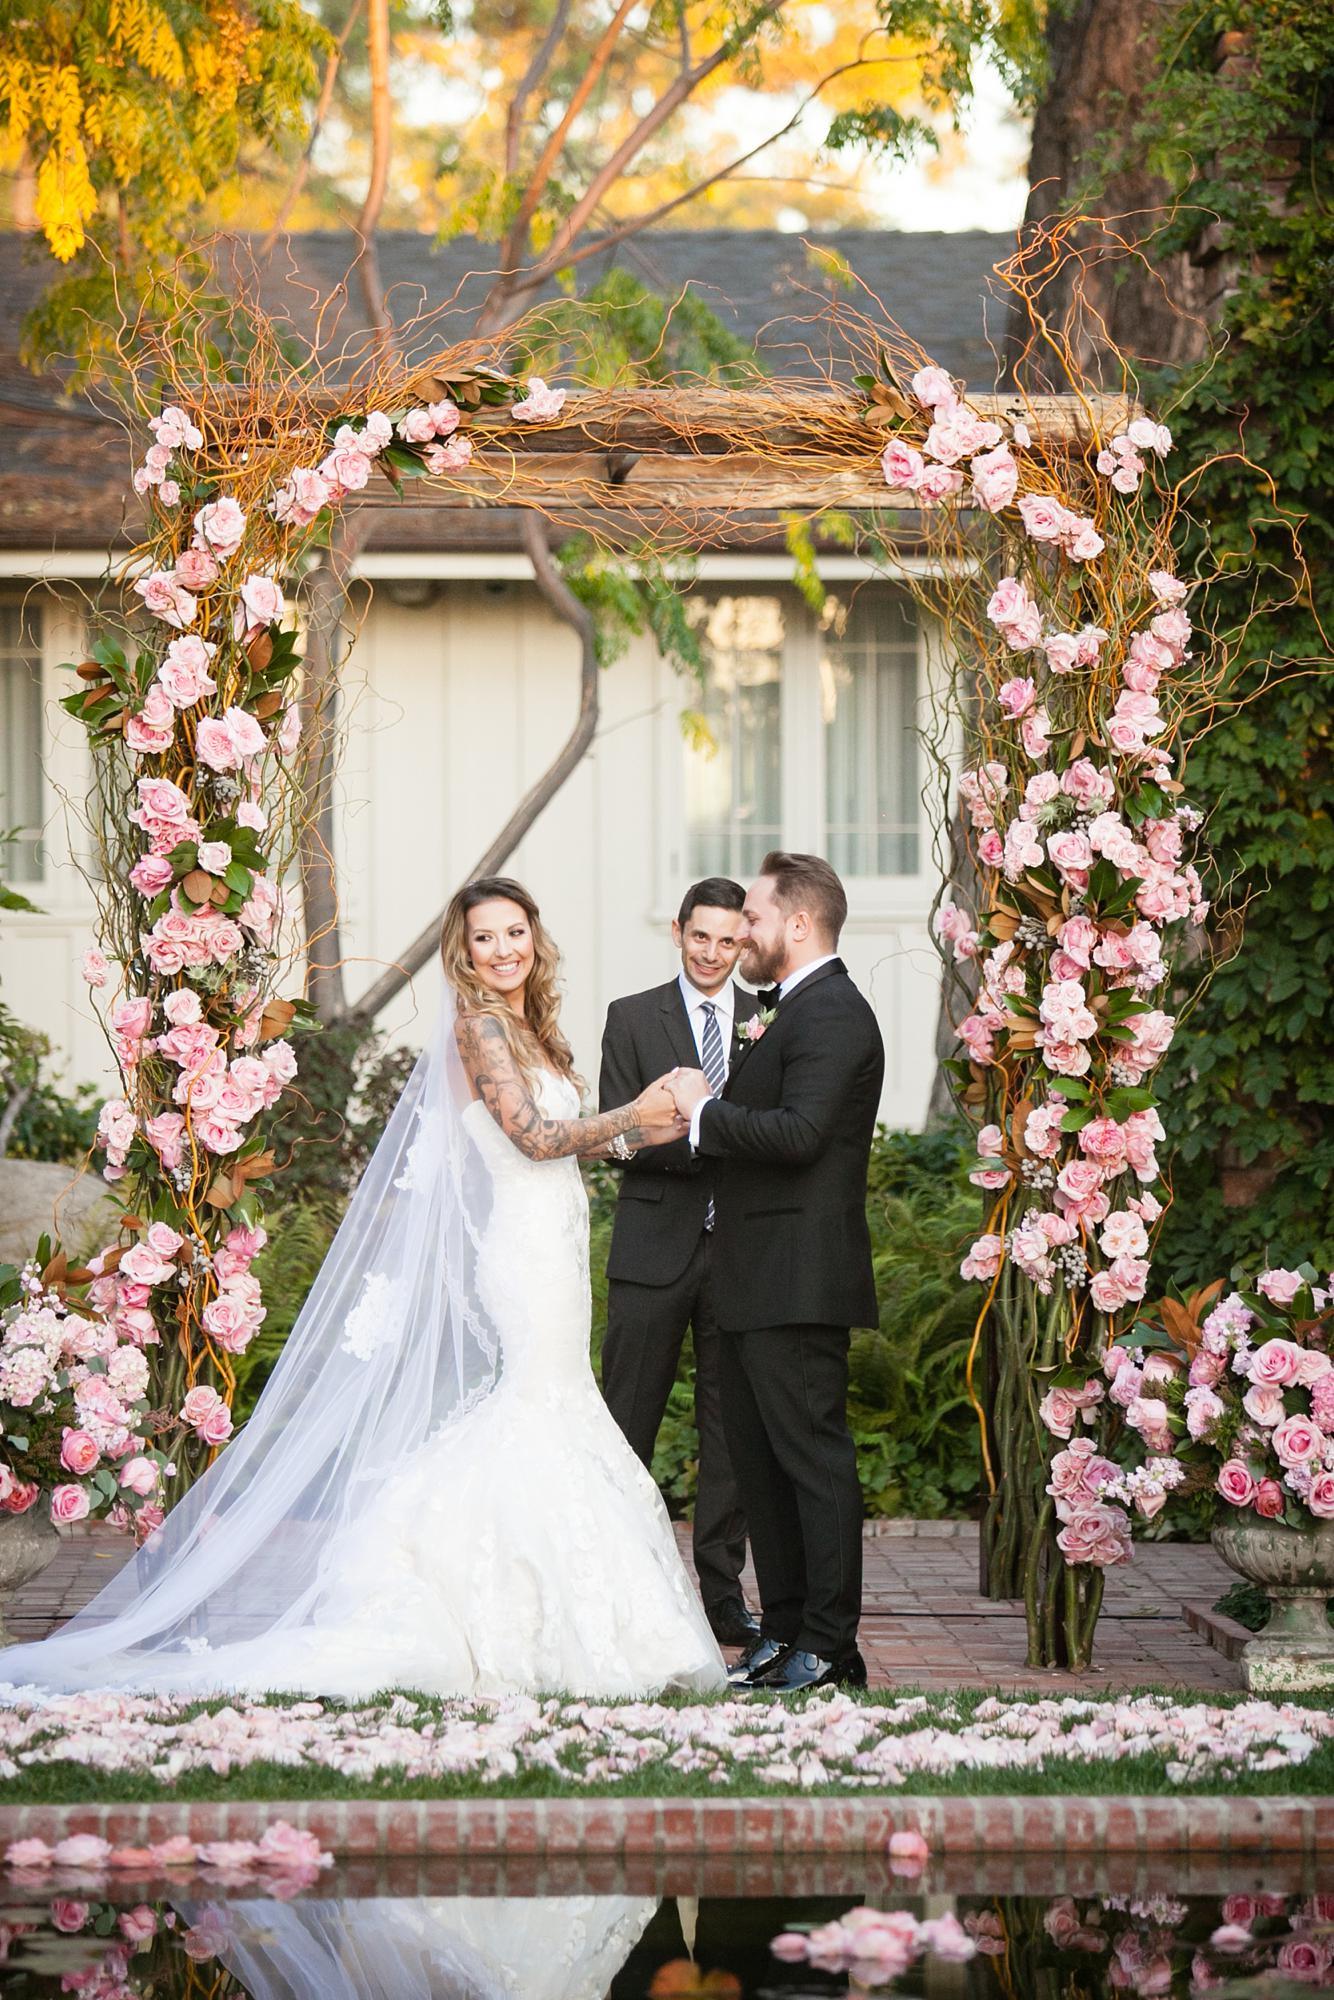 Belmond El Encanto Wedding | Miki & Sonja Photography | mikiandsonja.com